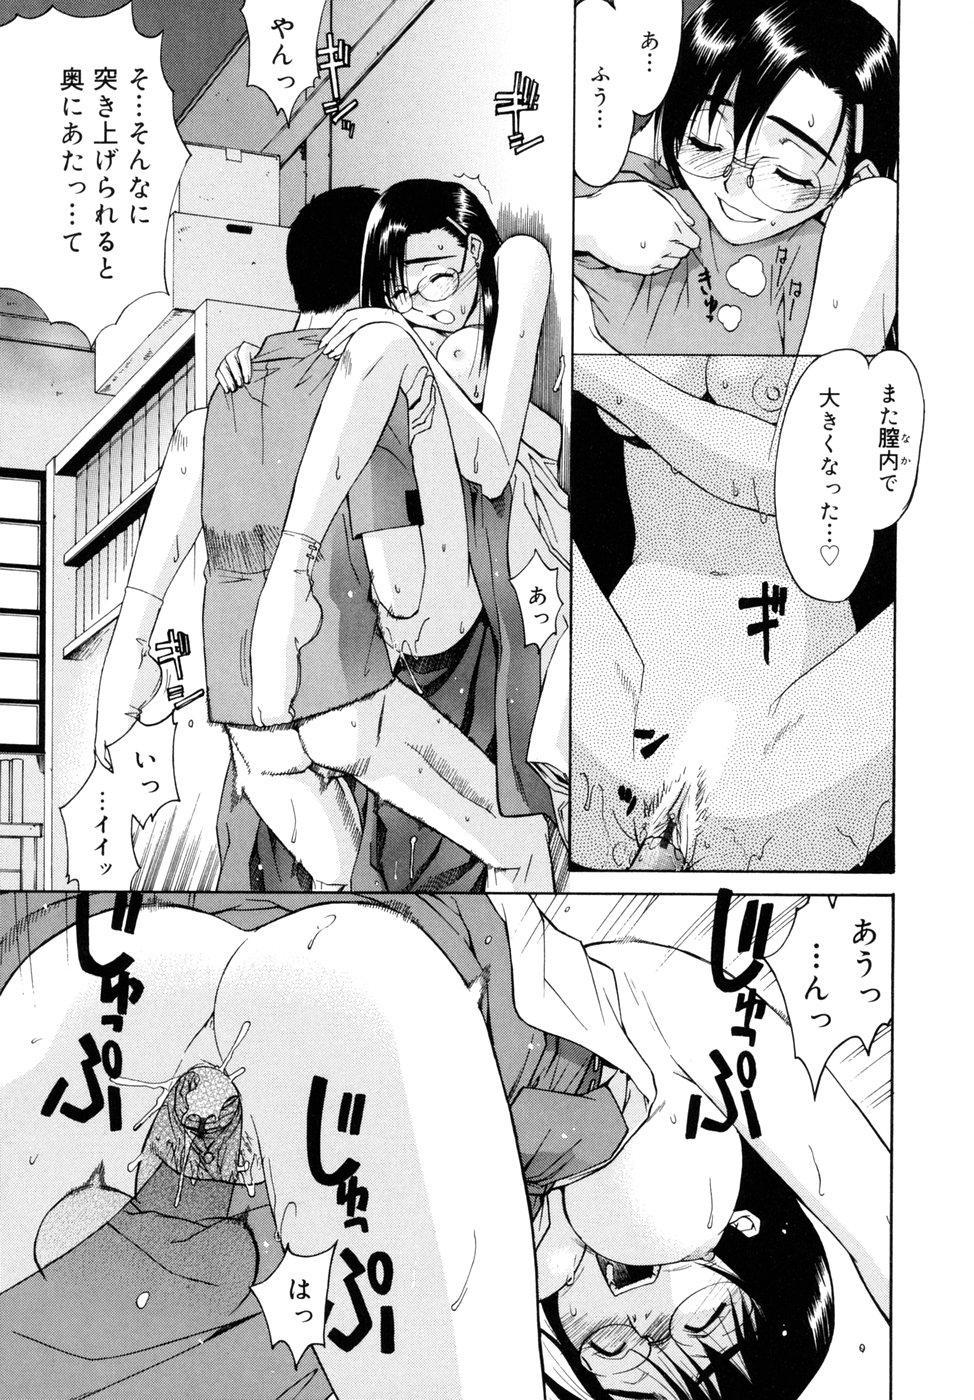 [Yaya Hinata] Tonari no Miko-san wa Minna Warau - The next shrine maidens smile in everyone. 118